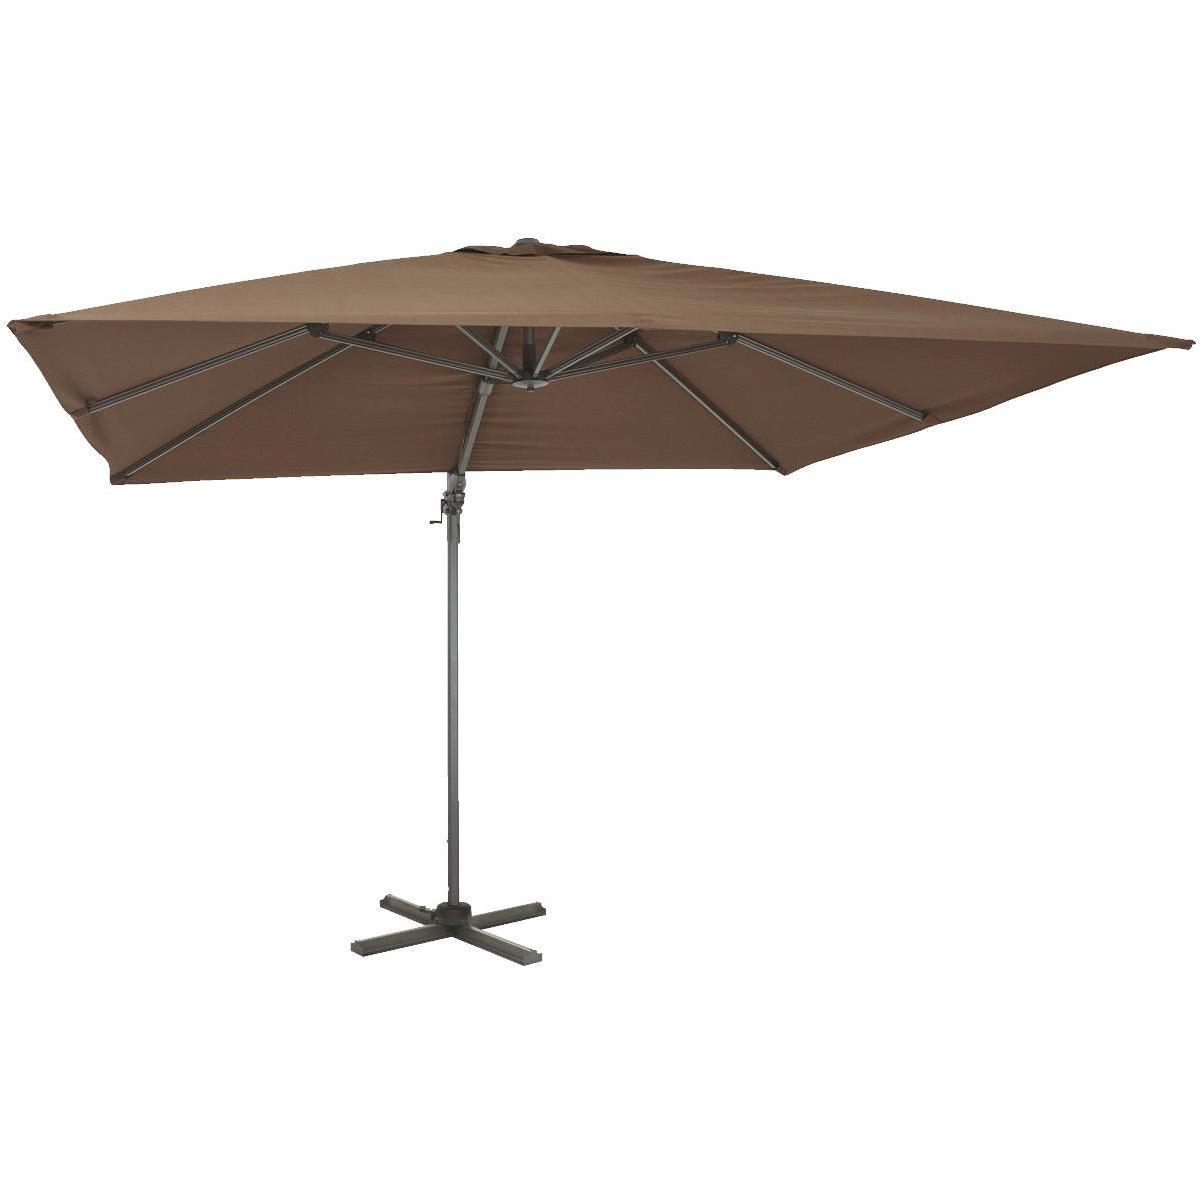 outdoor expressions 10 ft square aluminum offset brown patio umbrella